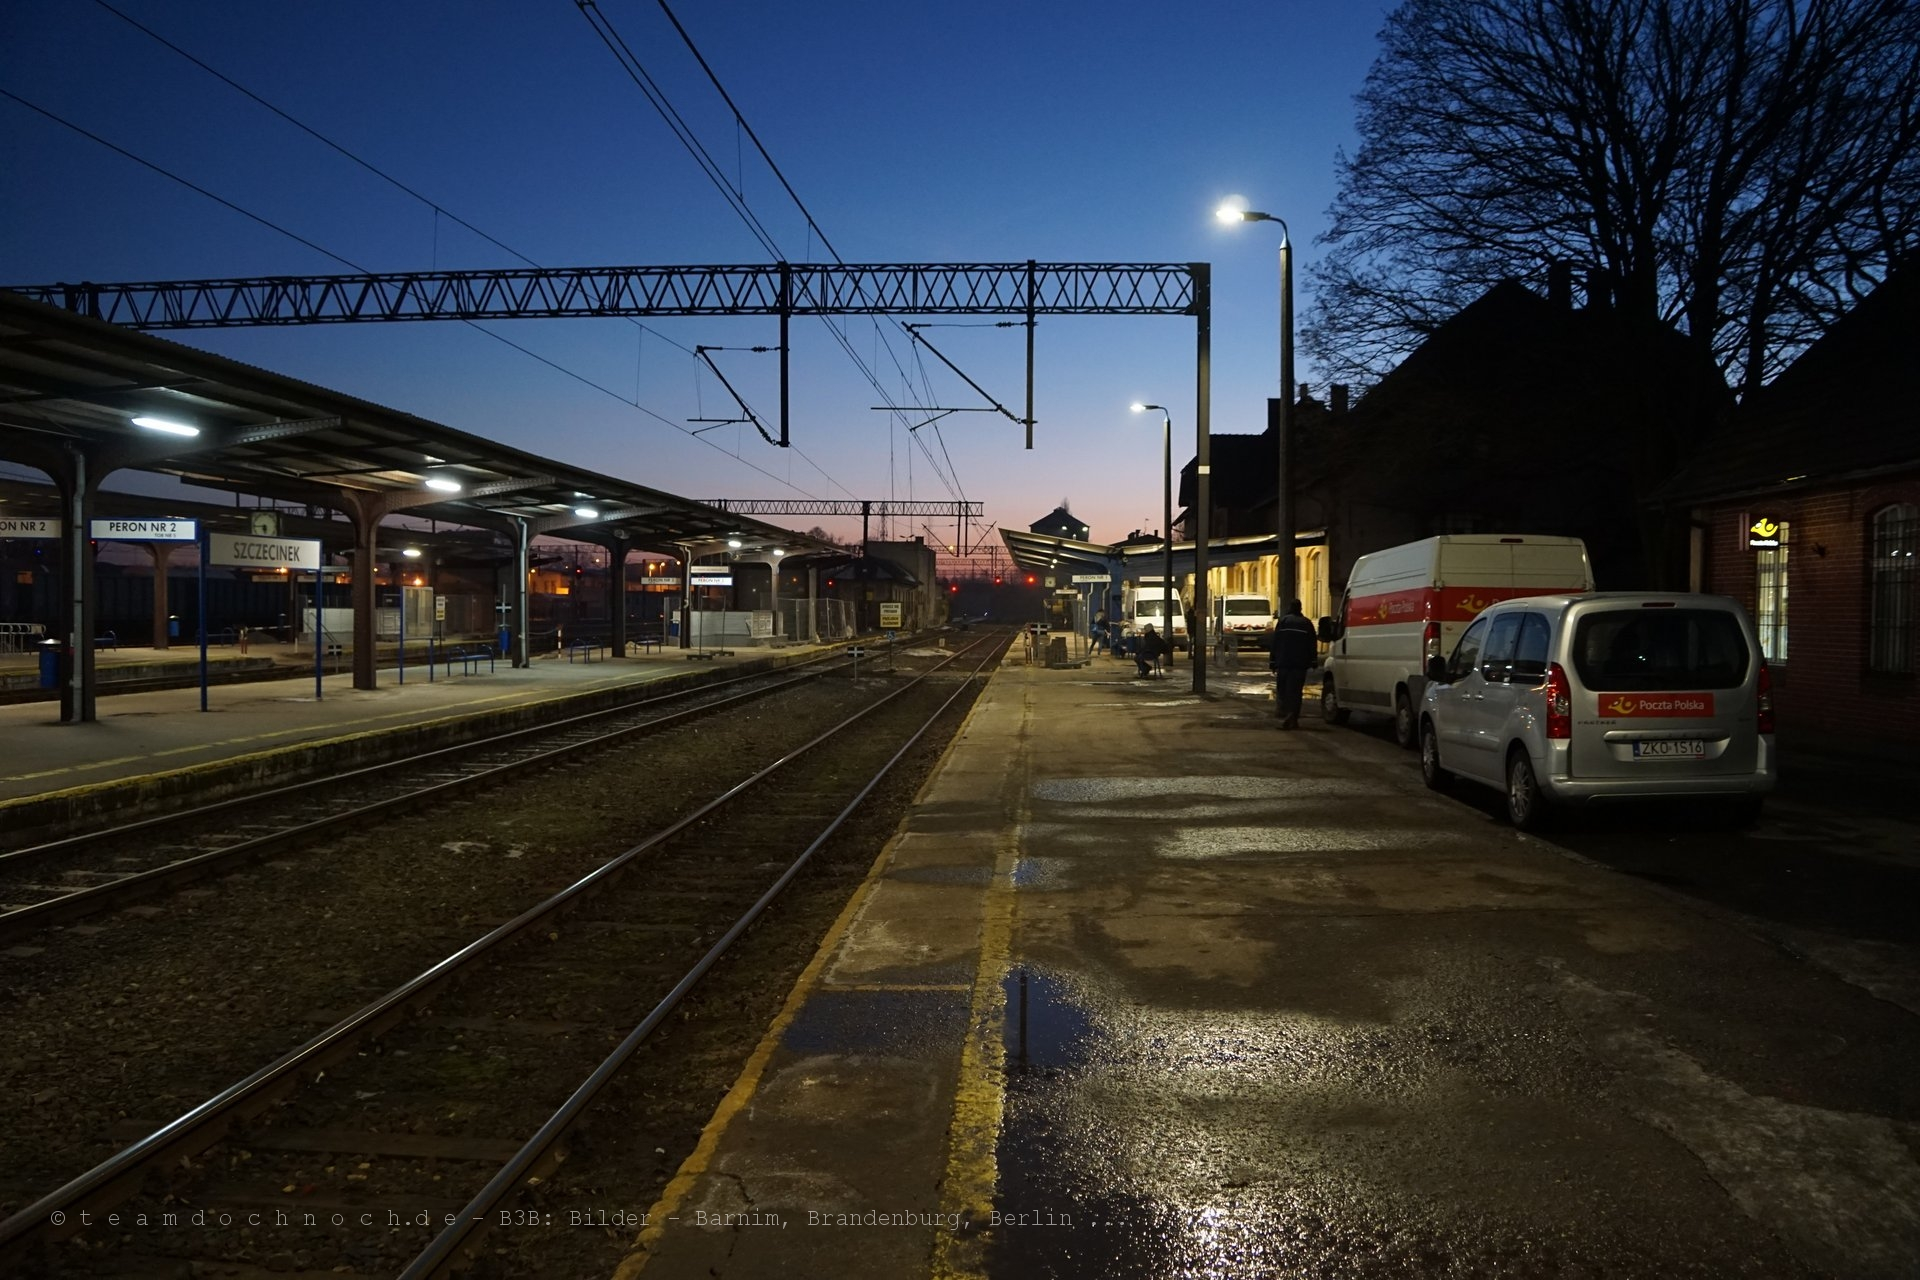 Bahnhof von Szczecinek